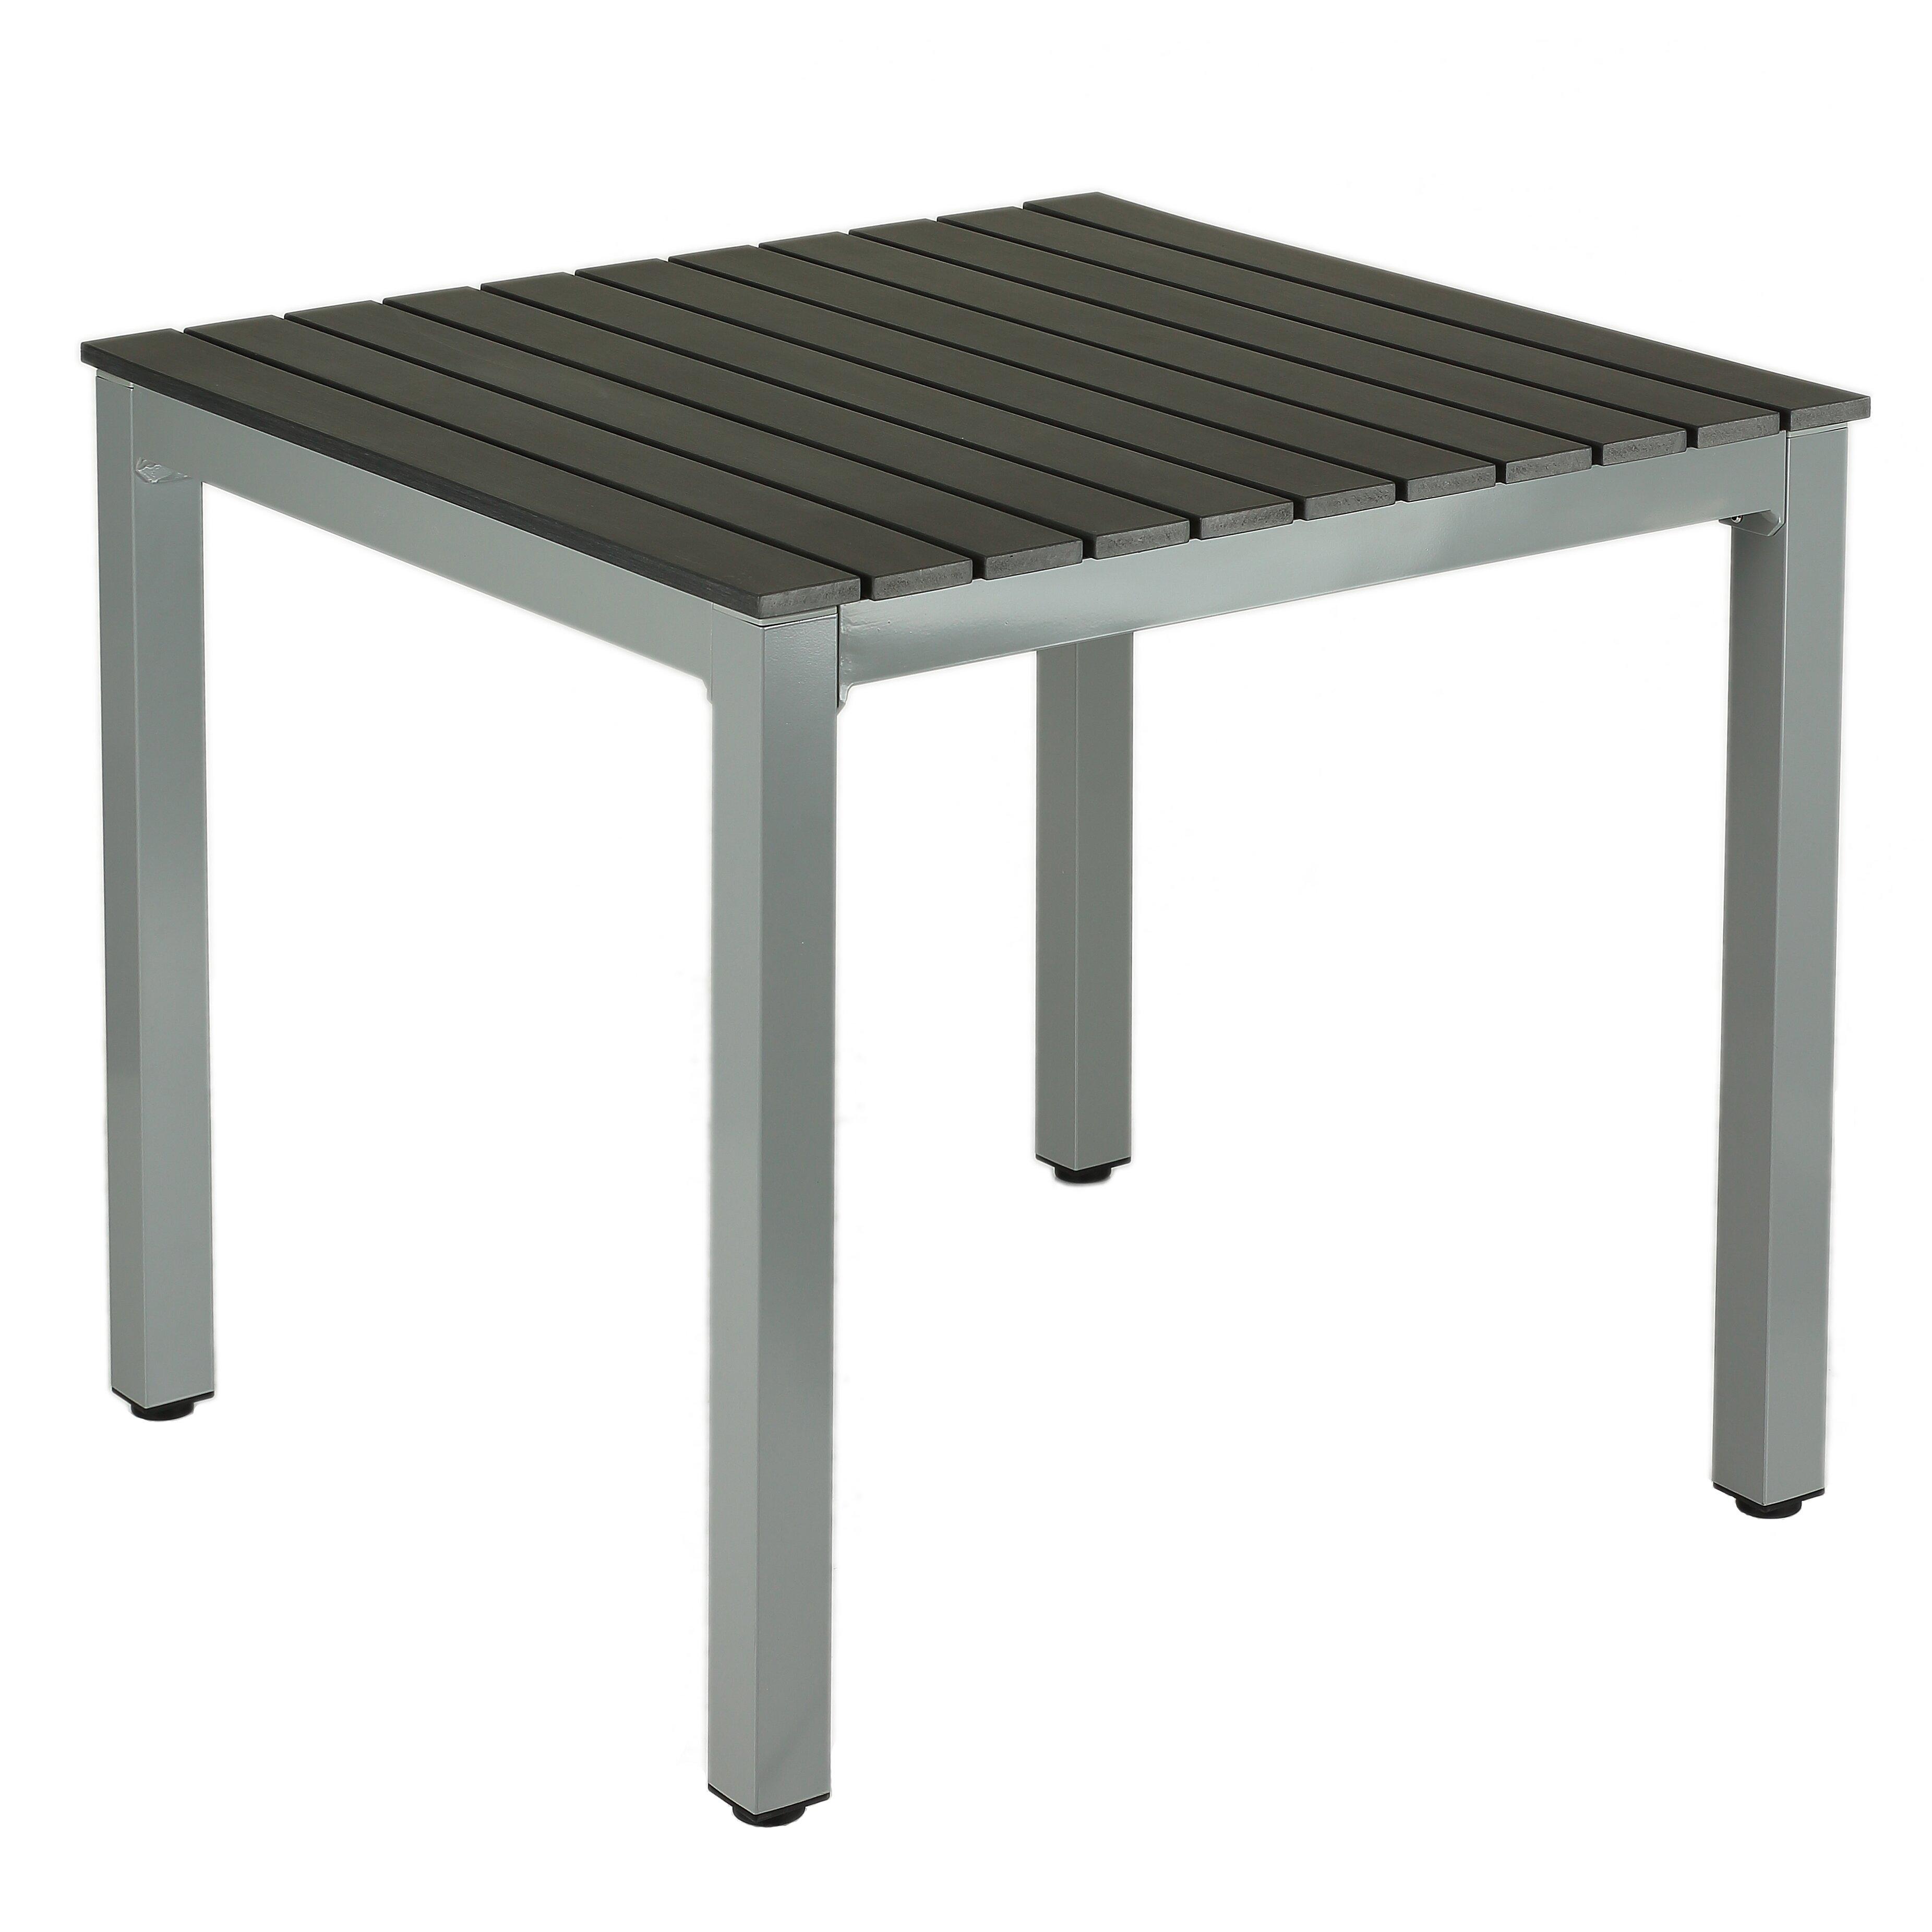 Aluminum Outdoor Dining Table Cortesi Home Jaxon Dining Table Reviews Wayfair